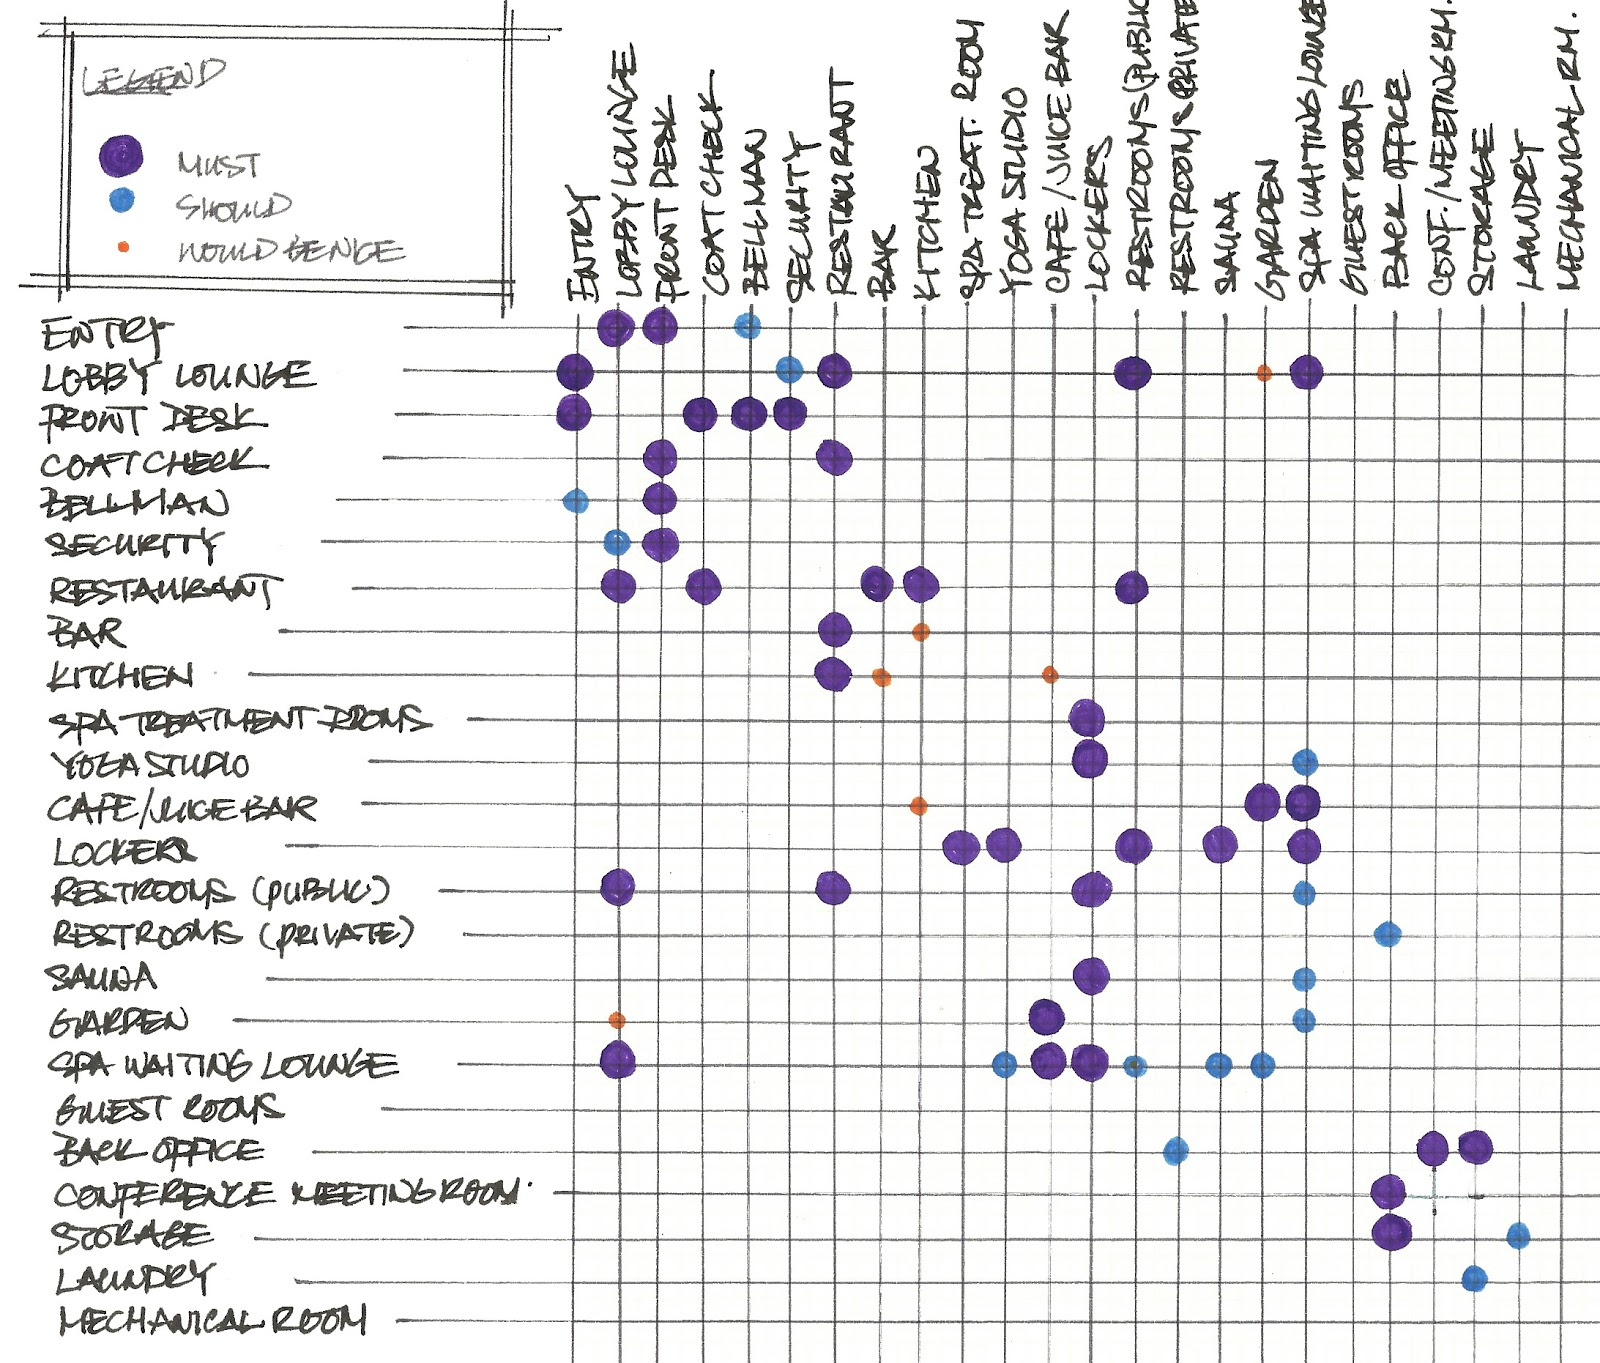 Diagram For 5 Gum Nissan Patrol Stereo Wiring Criteria Matrix / Adjacency Bubble | L.ko » Urban Hotel